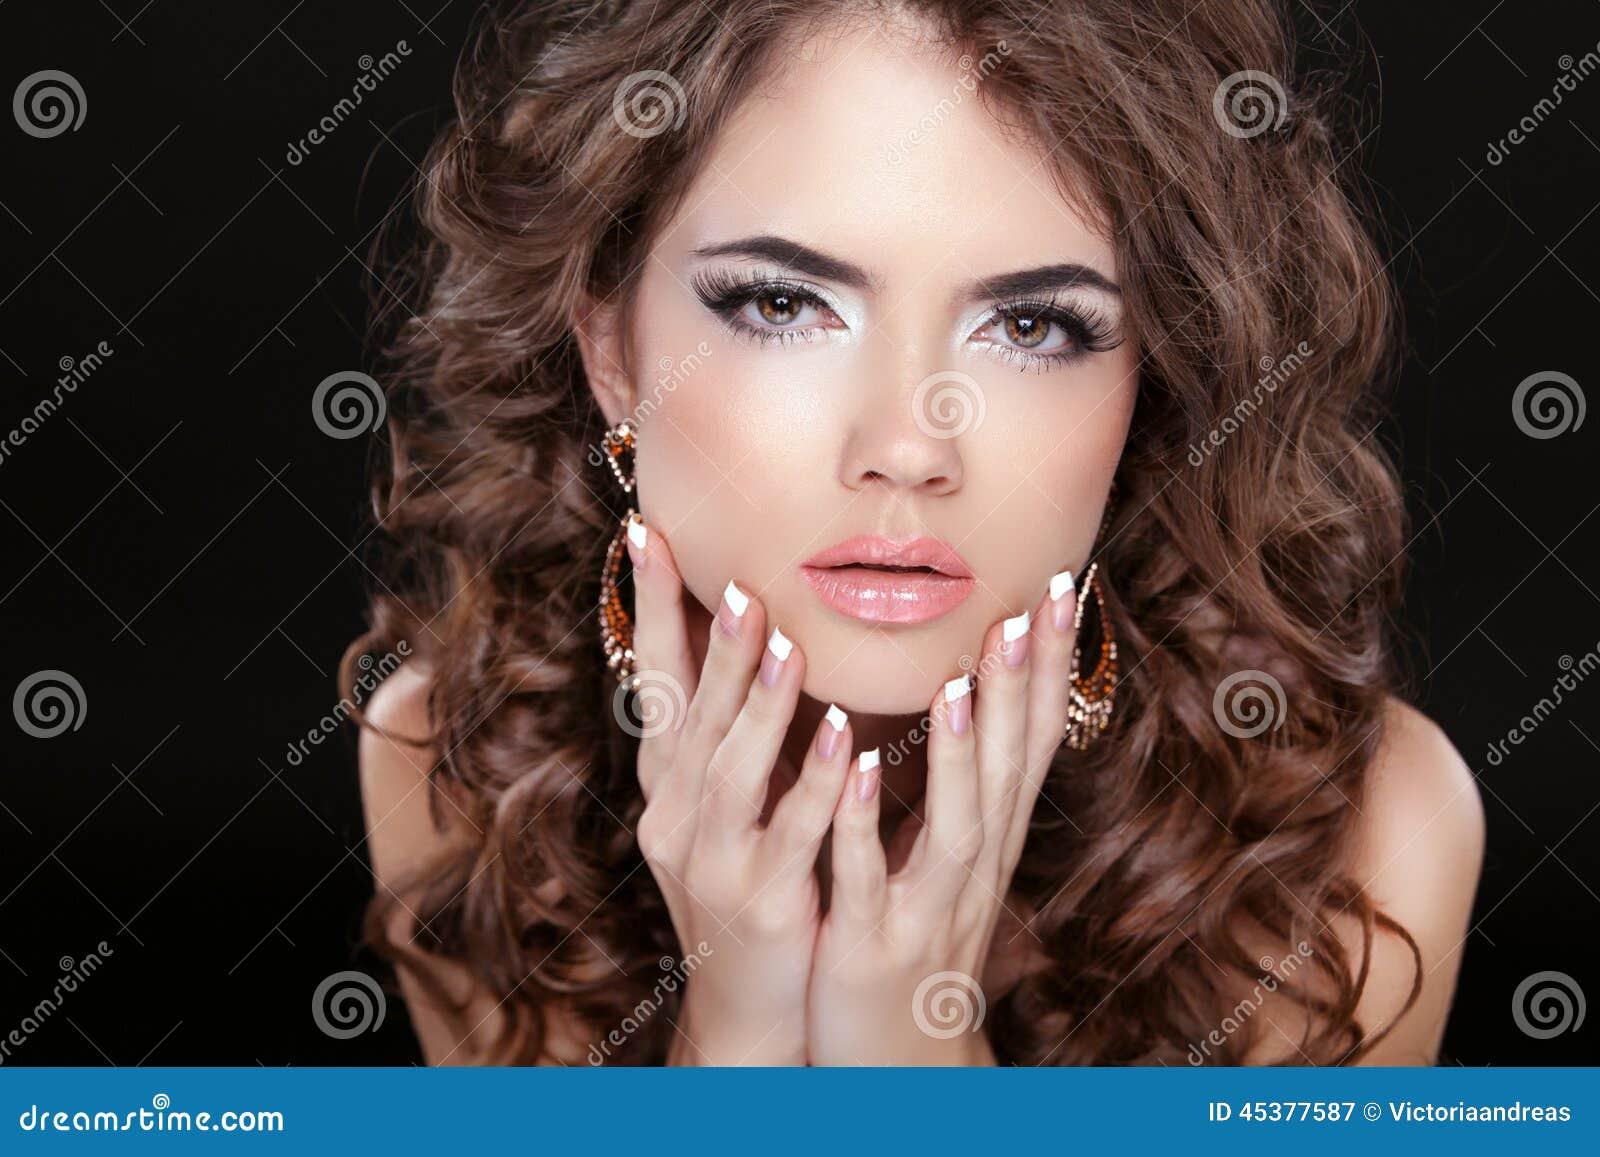 Beautiful Fashion Woman With Makeup, Long Wavy Hair And